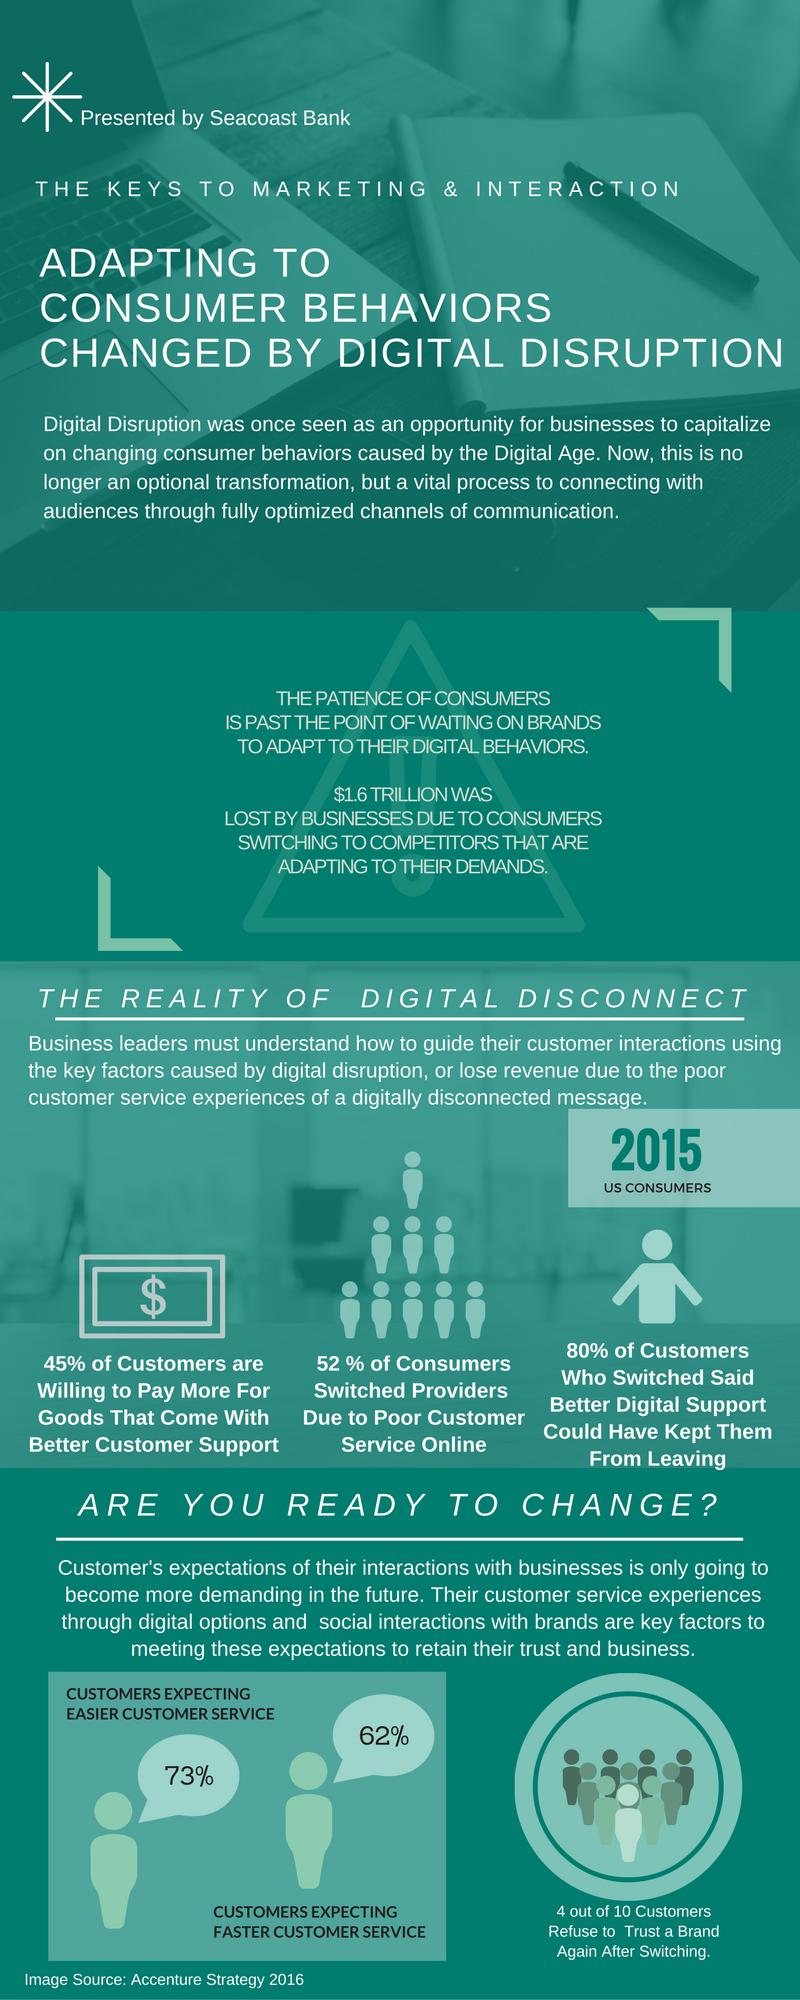 digital-disruption-better-interaction-customer-service.jpg